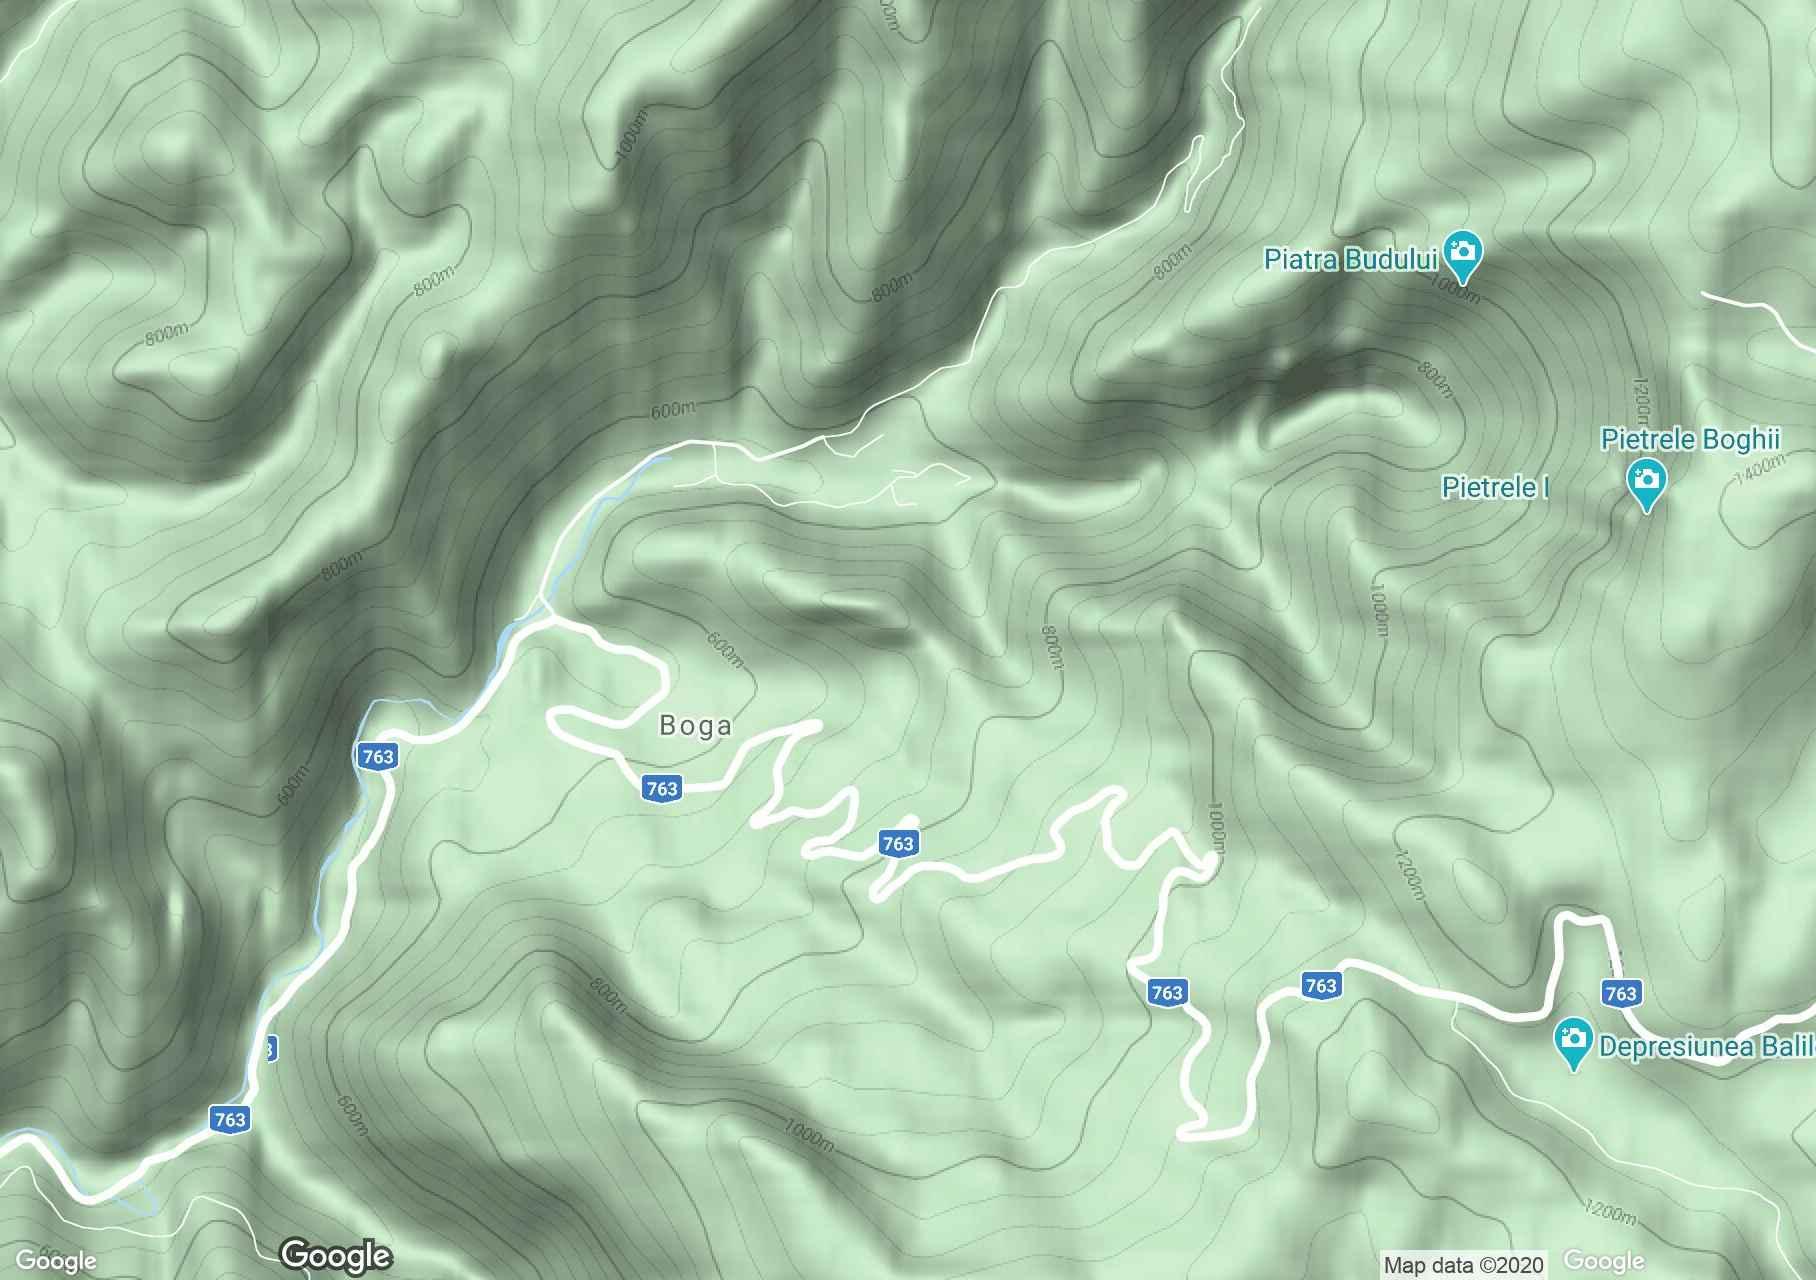 Boga interaktív turista térképe.